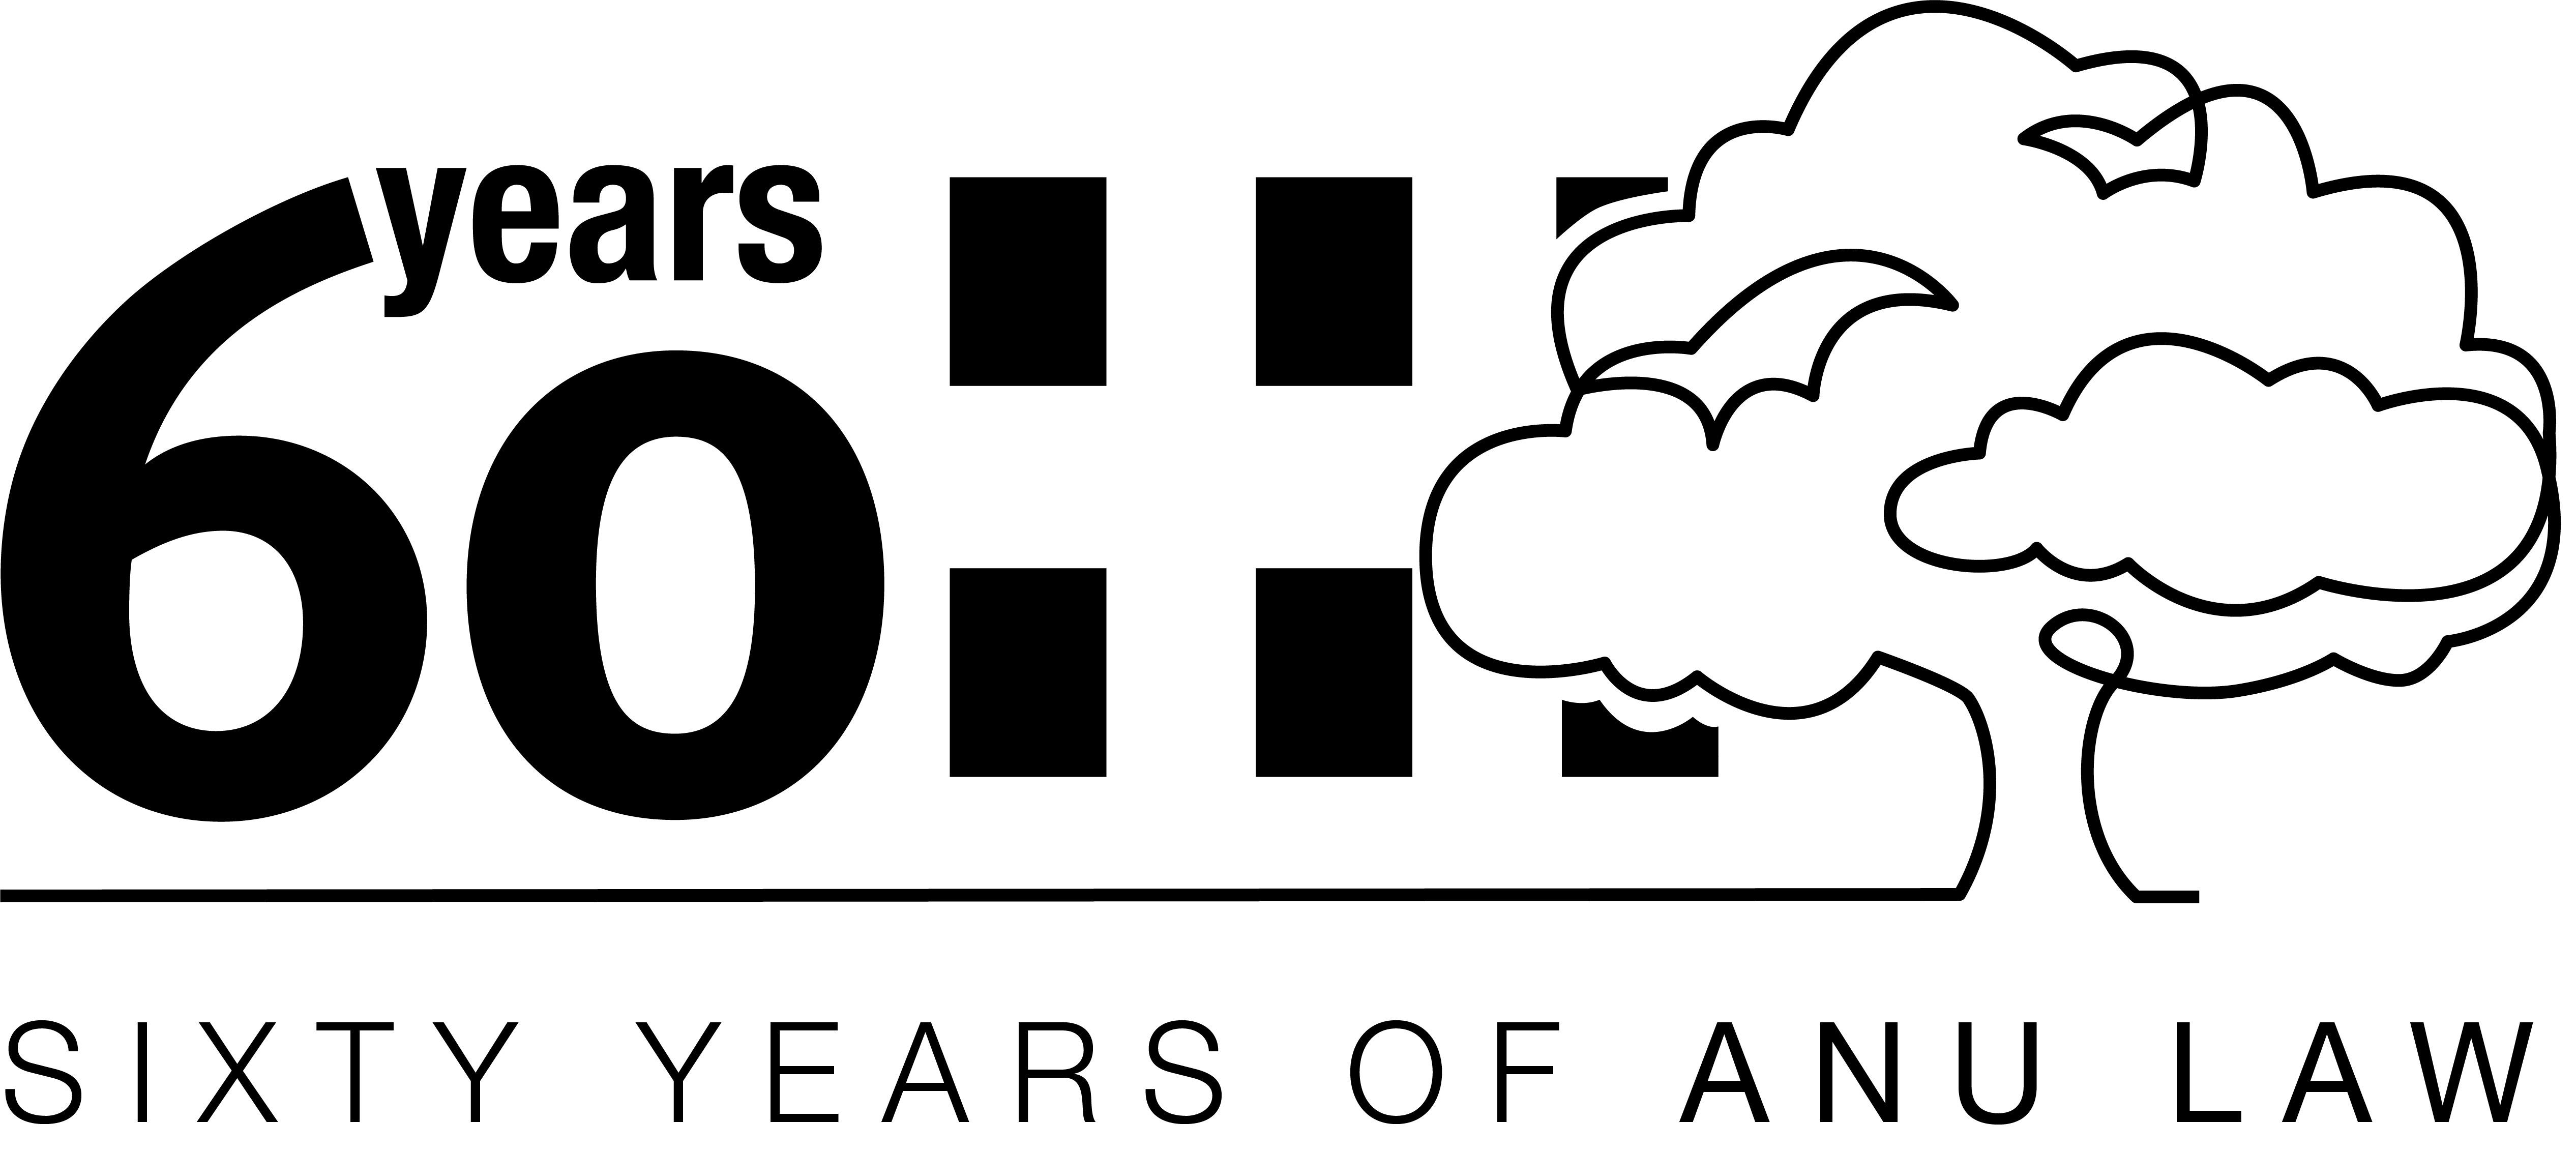 ANU Law 60th Anniversary